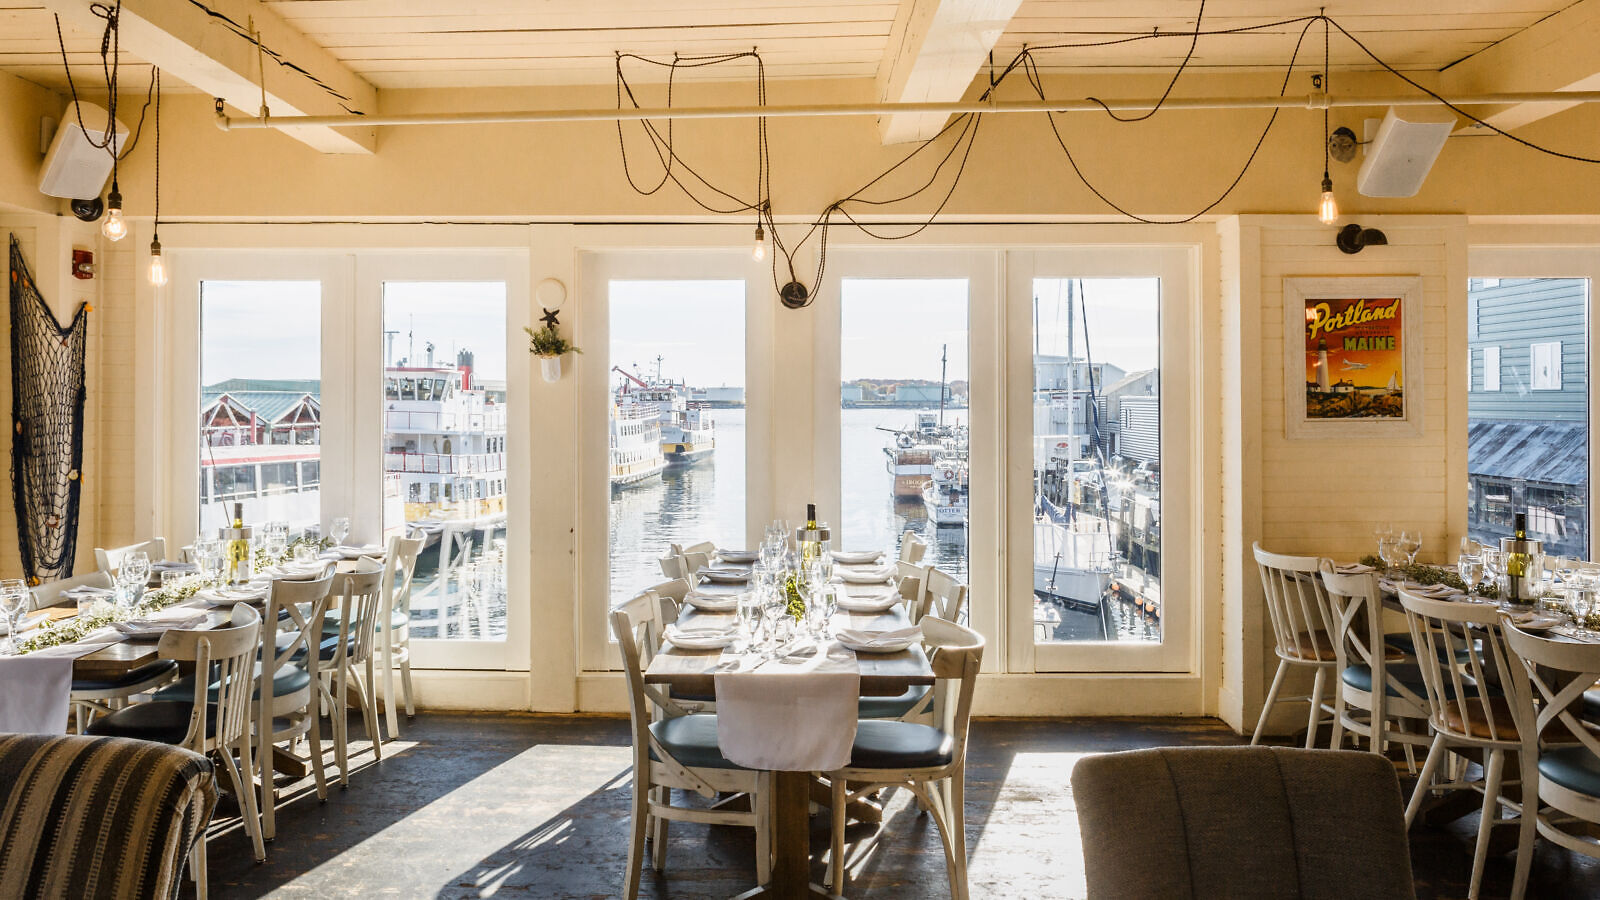 Portland Maine Restaurants Open On Christmas 2020 Home | Rí Rá Irish Pub & Restaurant. Private Parties